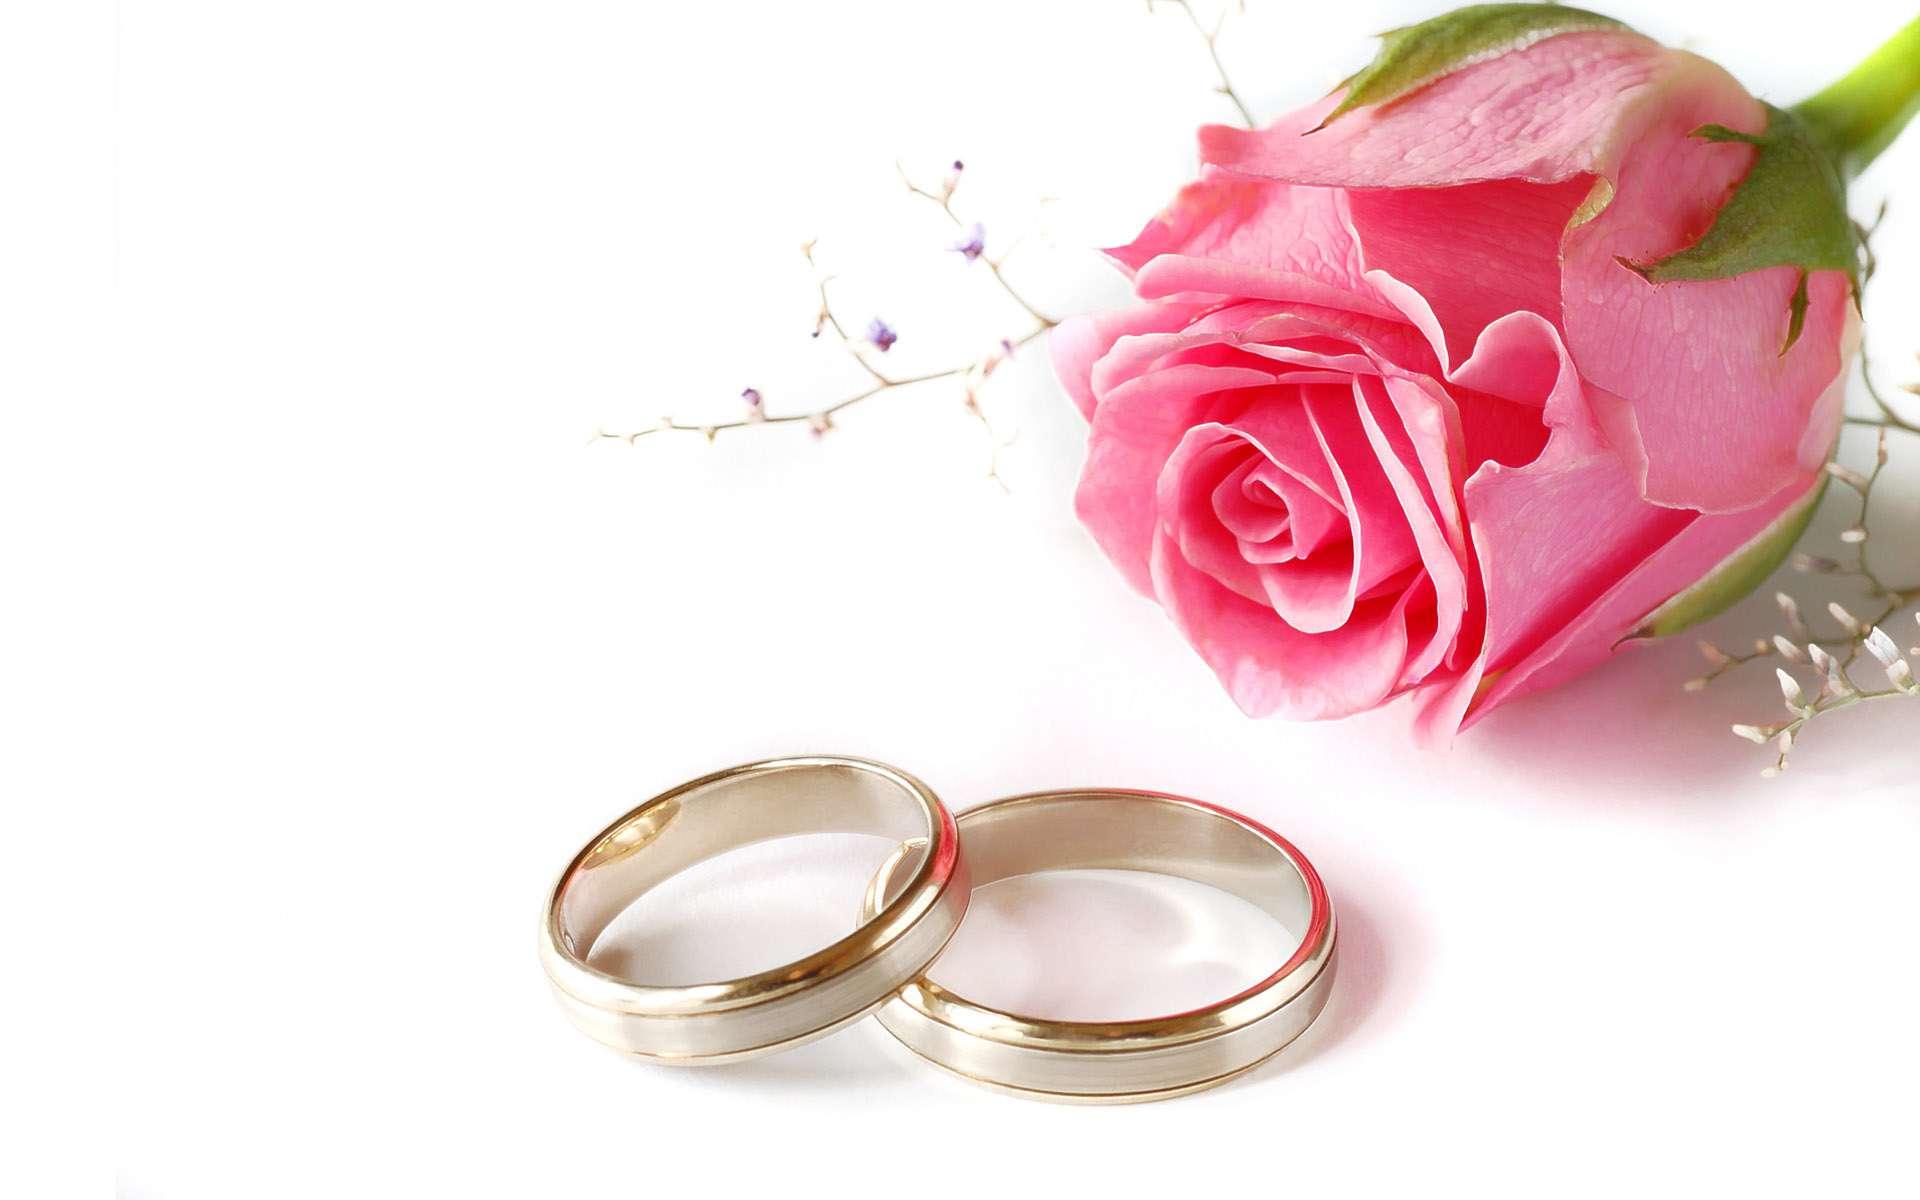 Wedding Background Design Hd Magdalene Project Org